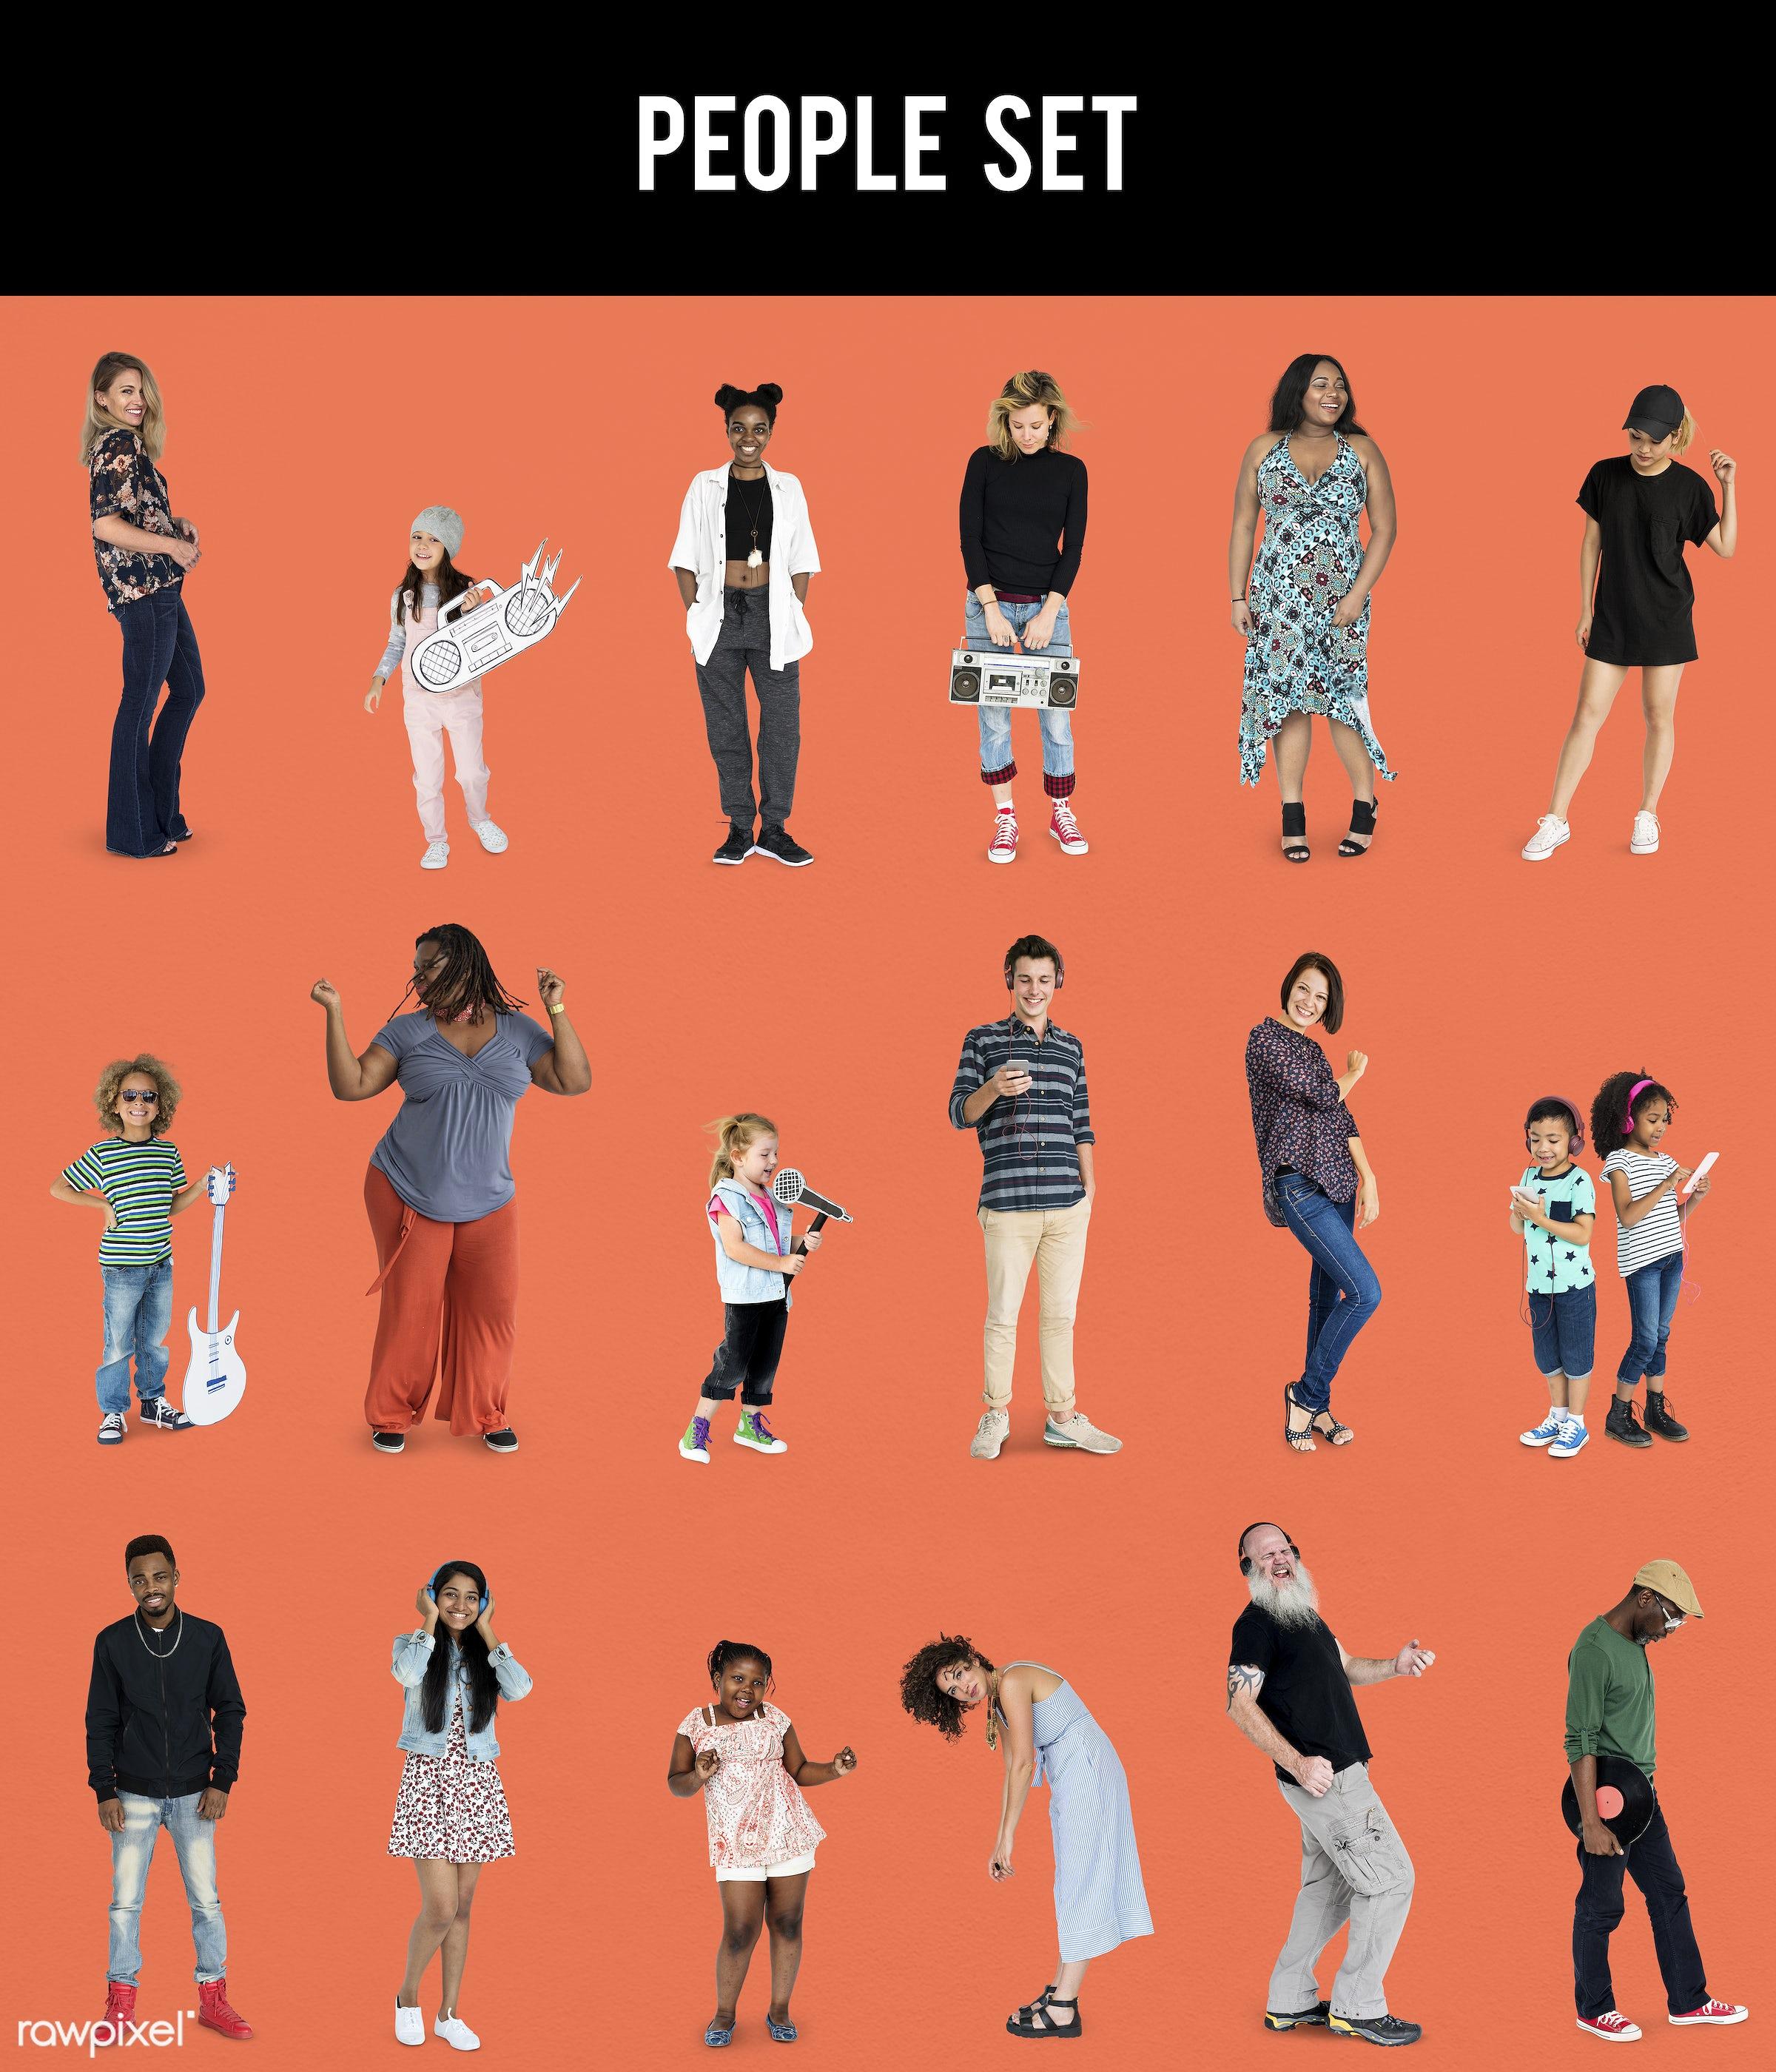 studio, person, diverse, entertain, recreation, people, caucasian, asian, woman, lifestyle, studio squareset, cheerful,...